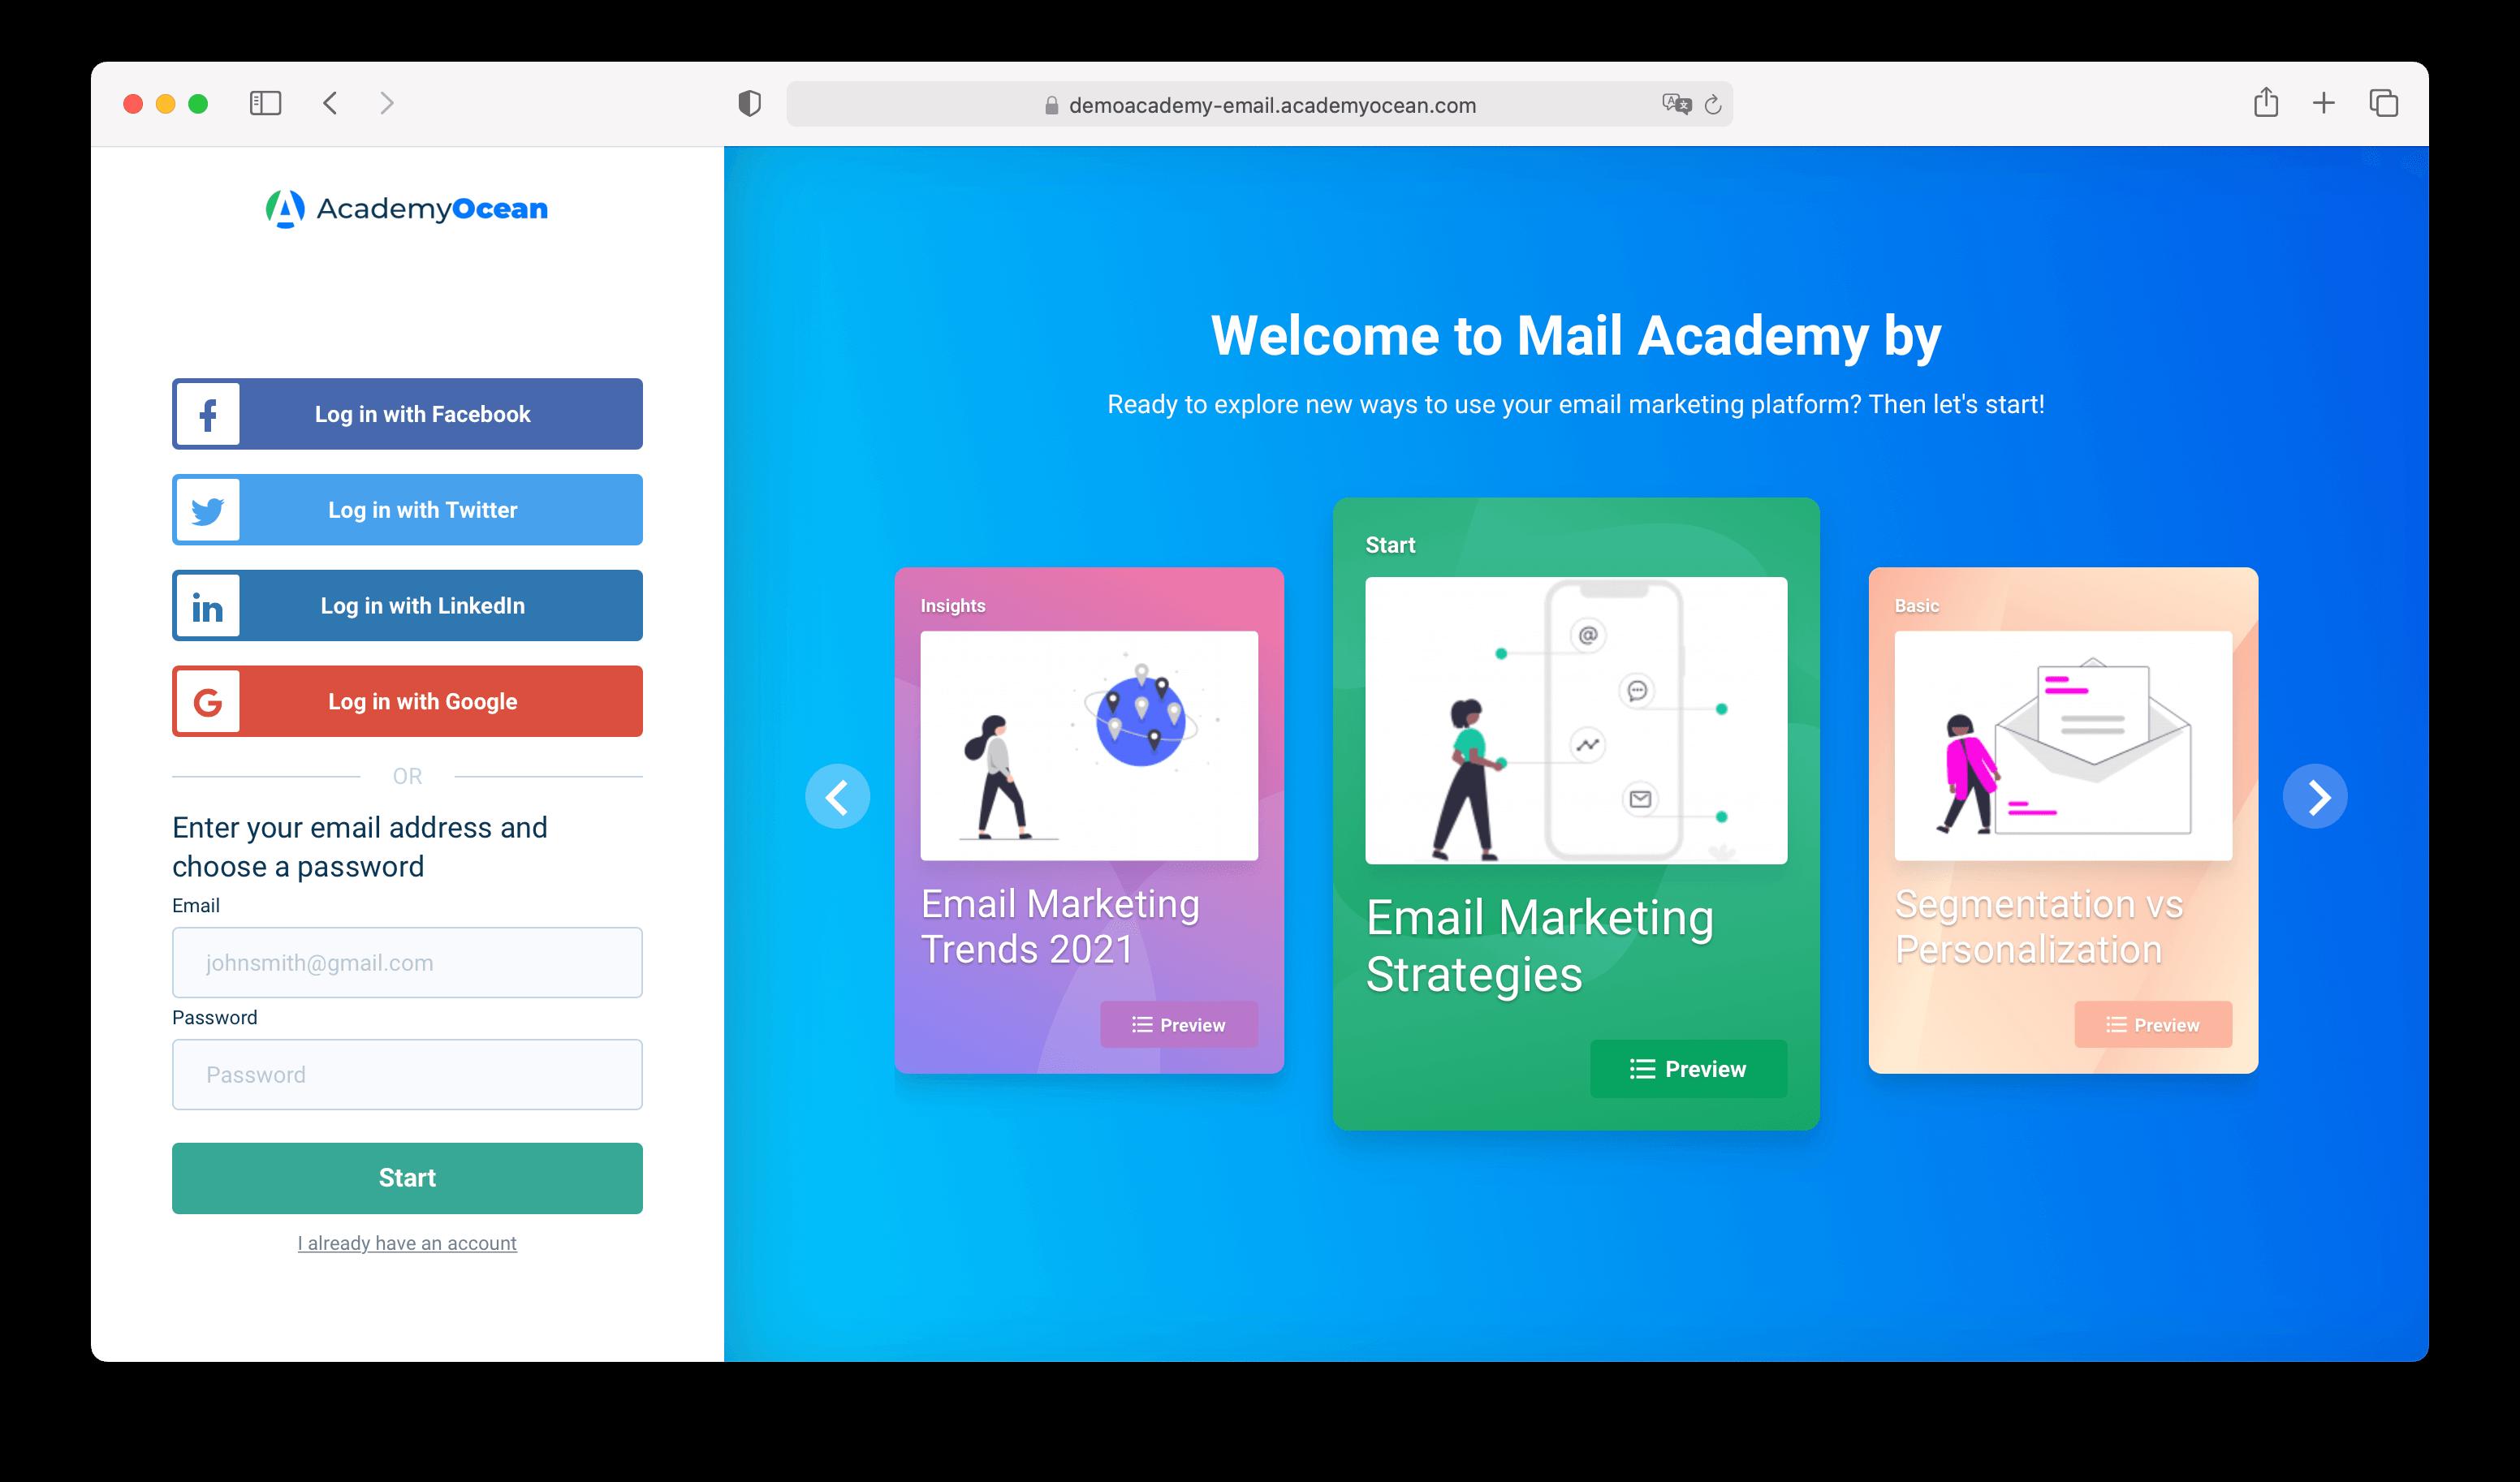 Email academy by AcademyOcean